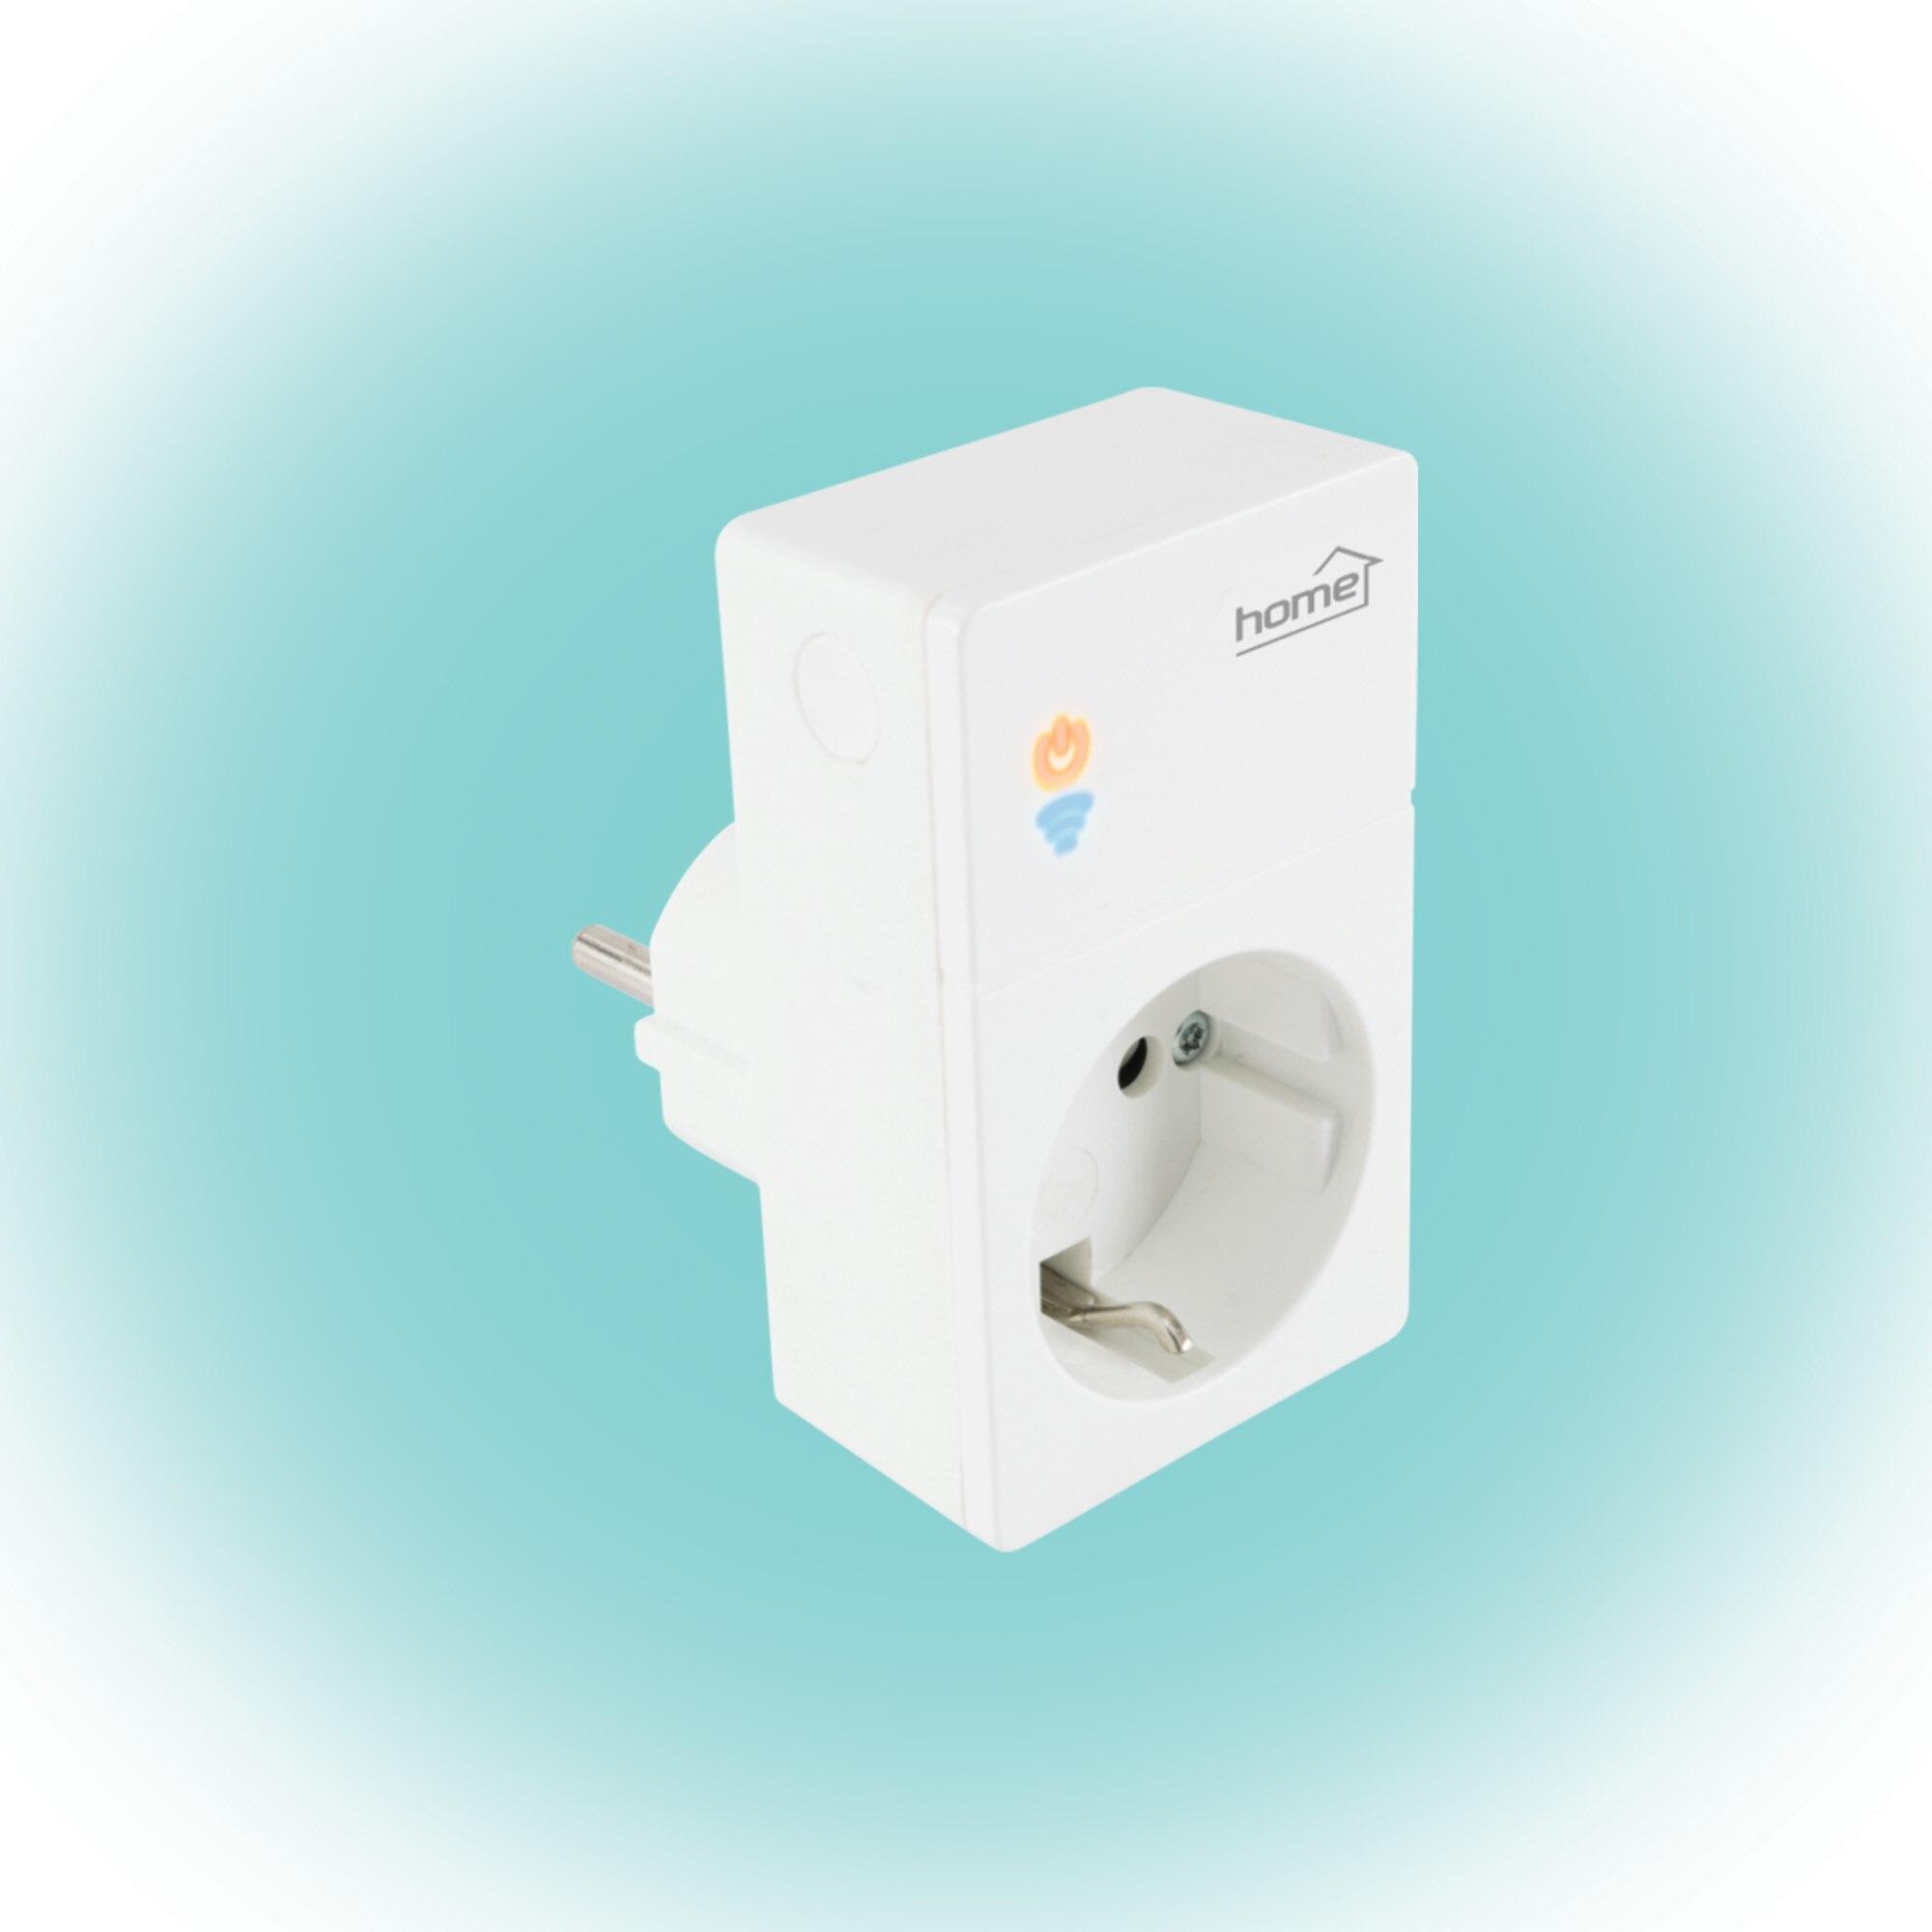 Home by Somogyi NVS 1 Smart (WiFi) aljzat